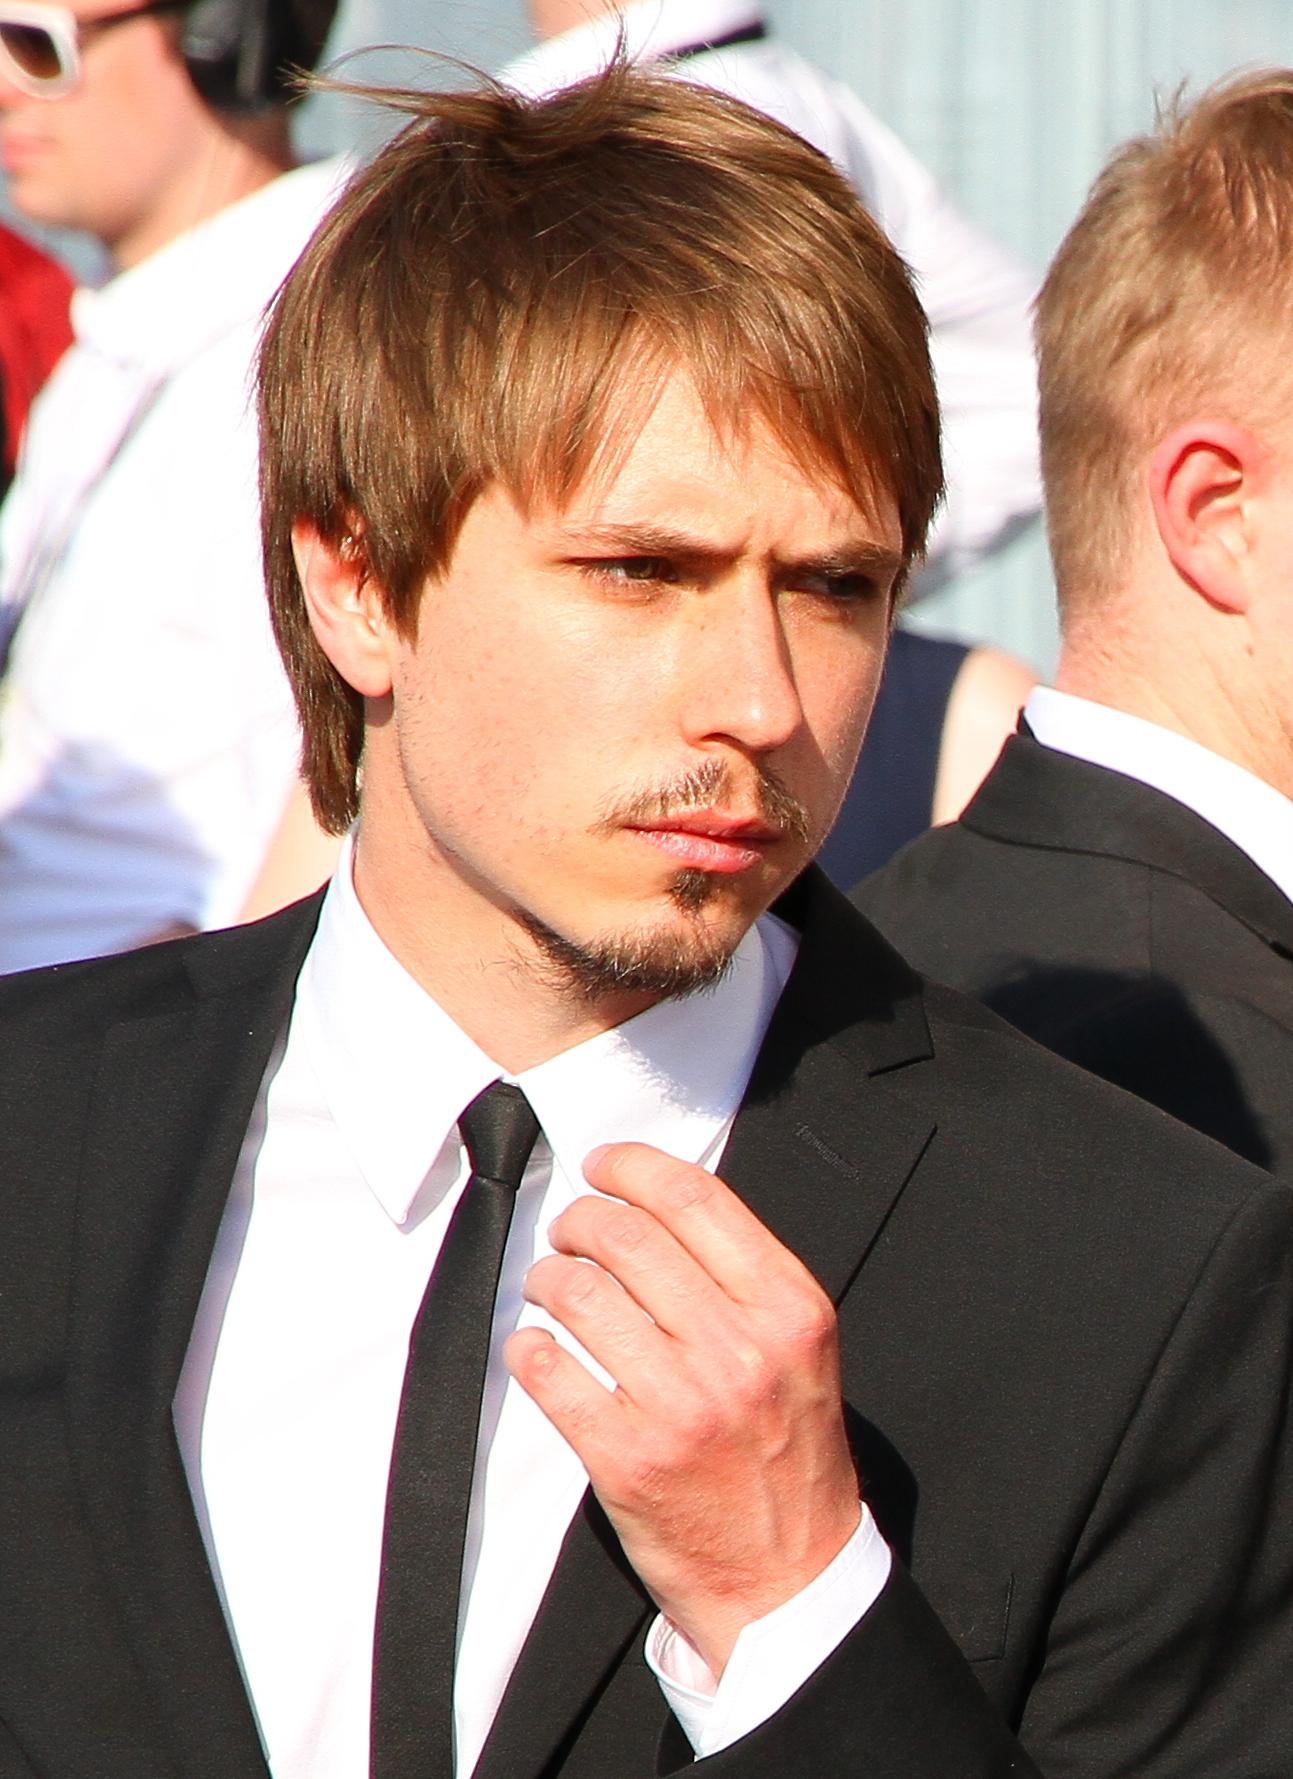 Joe Thomas Actor Wikipedia